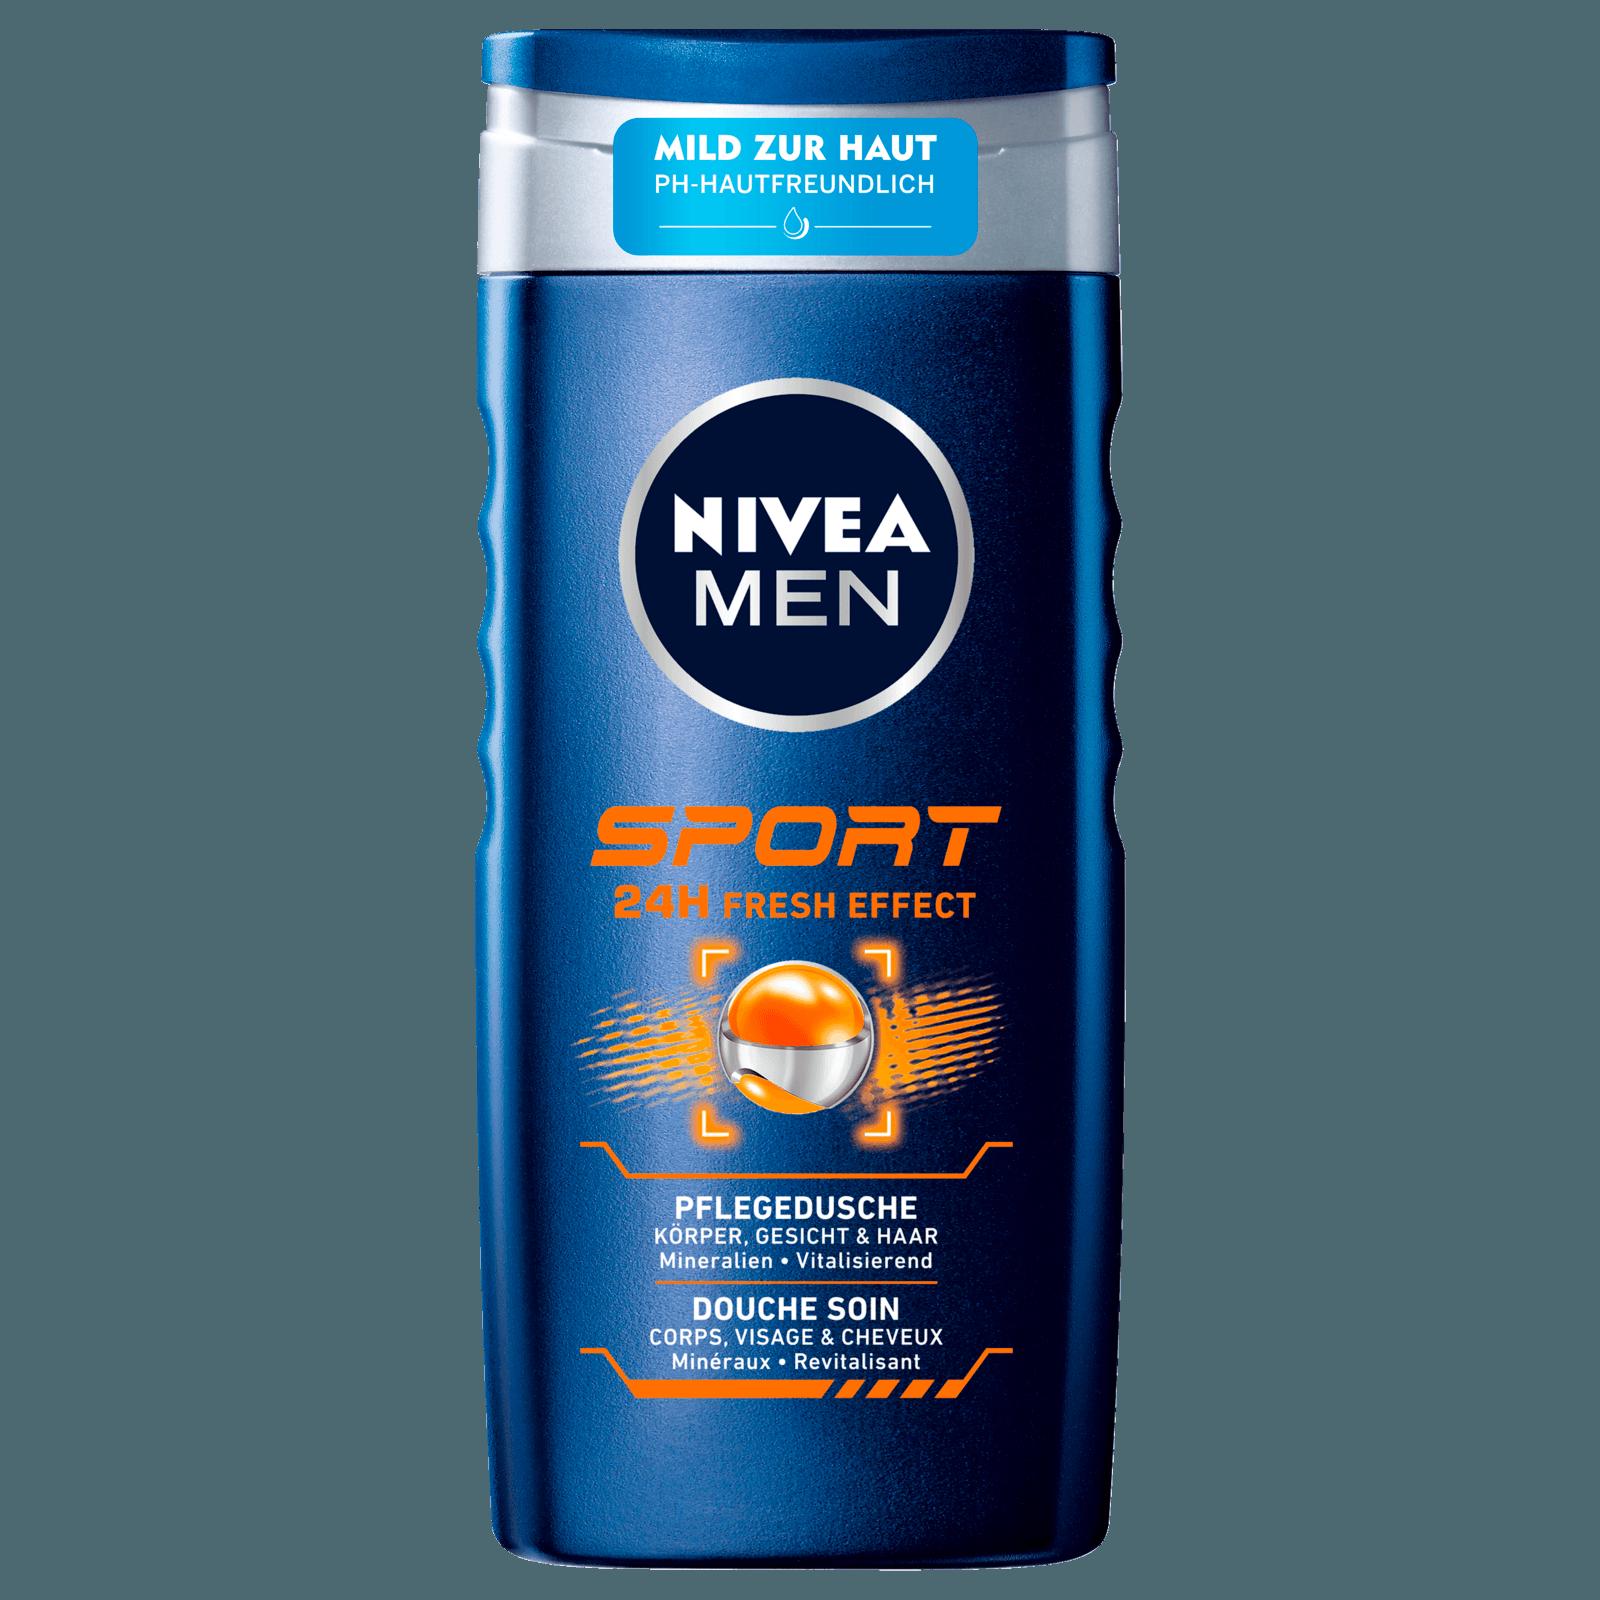 Nivea Men Sport Pflegedusche Duschgel 250ml